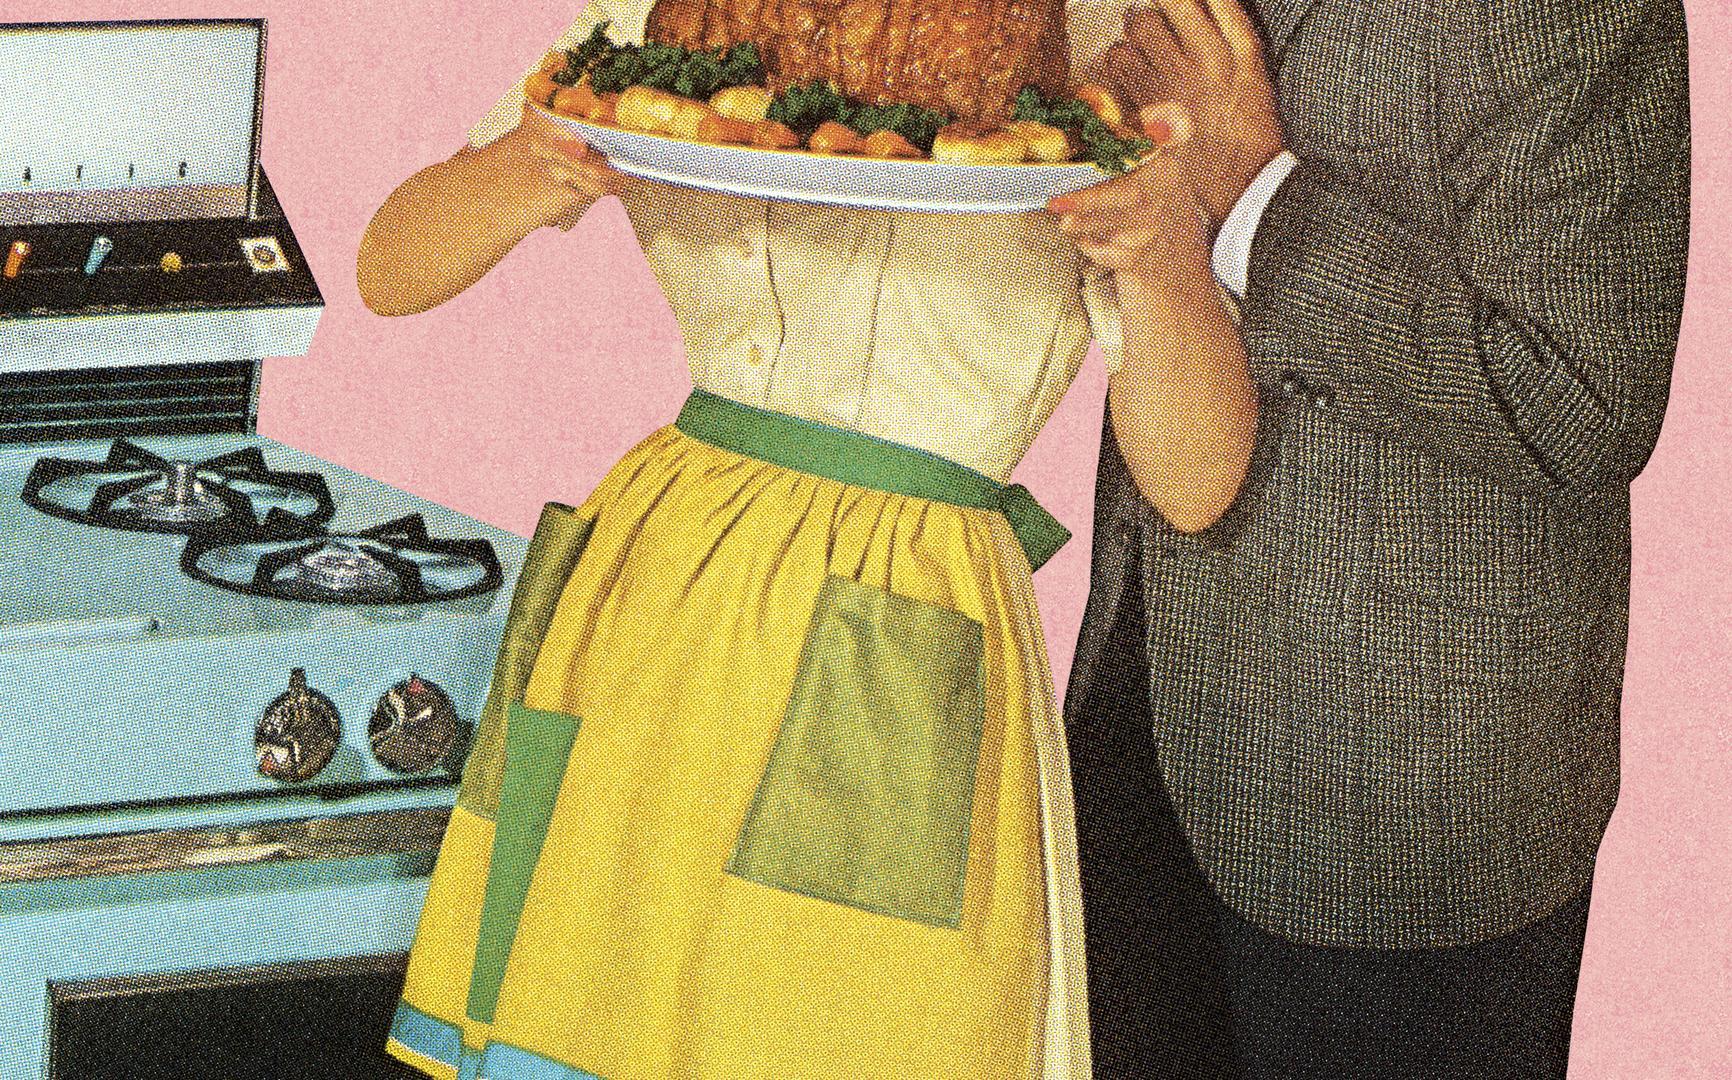 Frau Hausfrau 50er Jahre